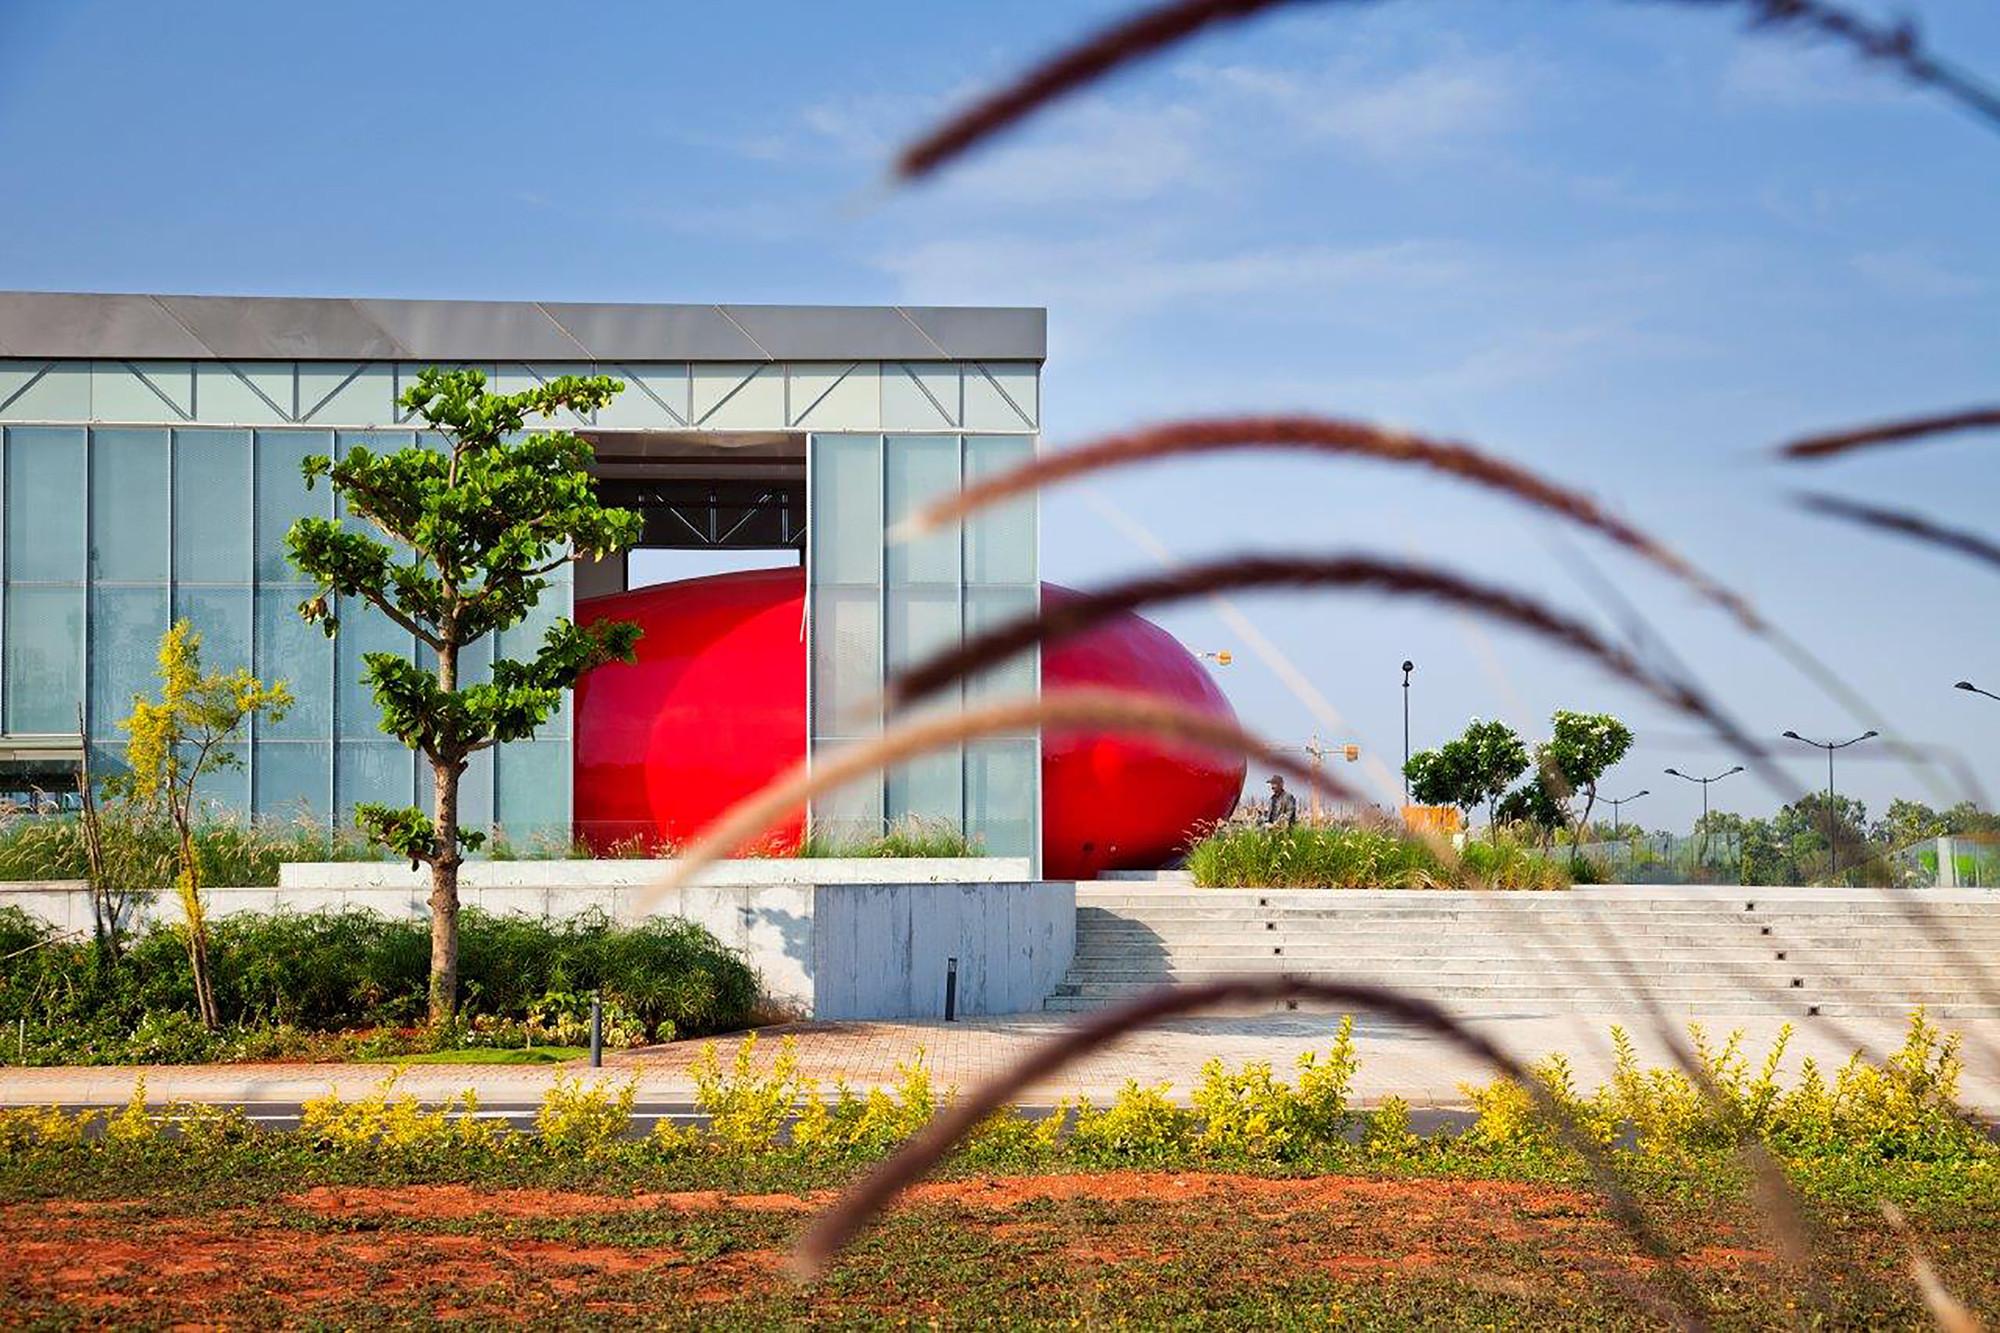 Discovery Centre / Architecture Discipline, © Jeetin Sharma